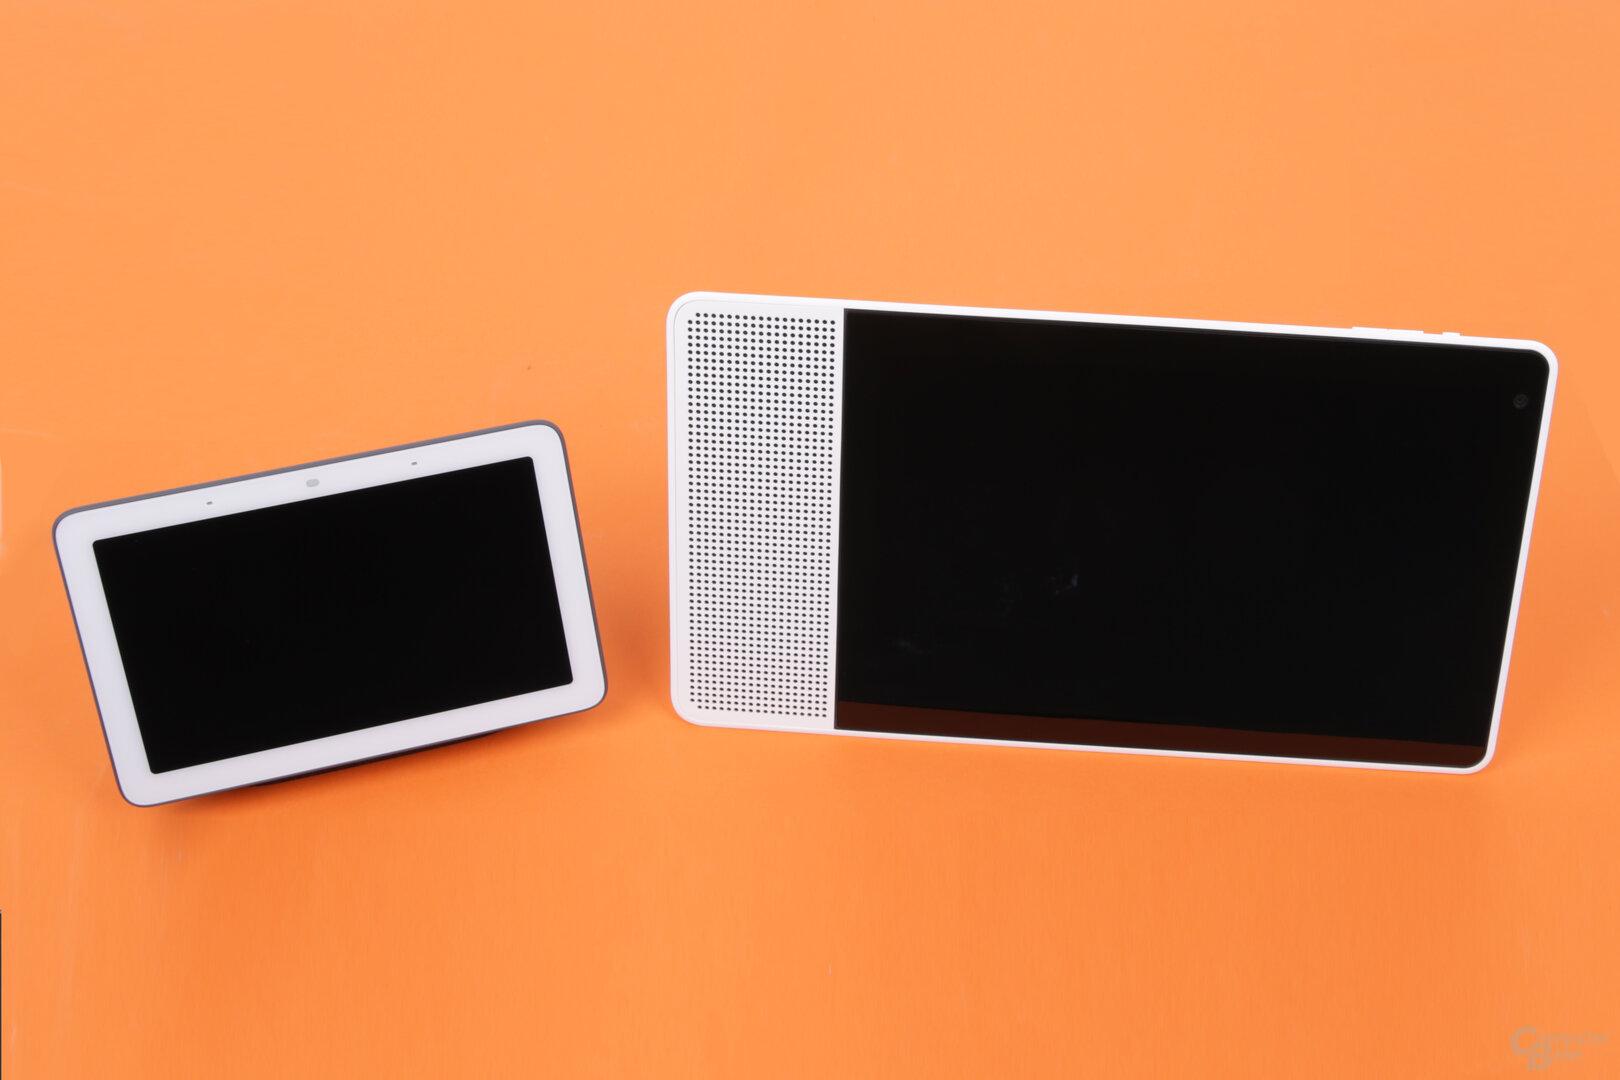 Google Nest Hub mit 7 Zoll neben Lenovo Smart Display mit 10 Zoll